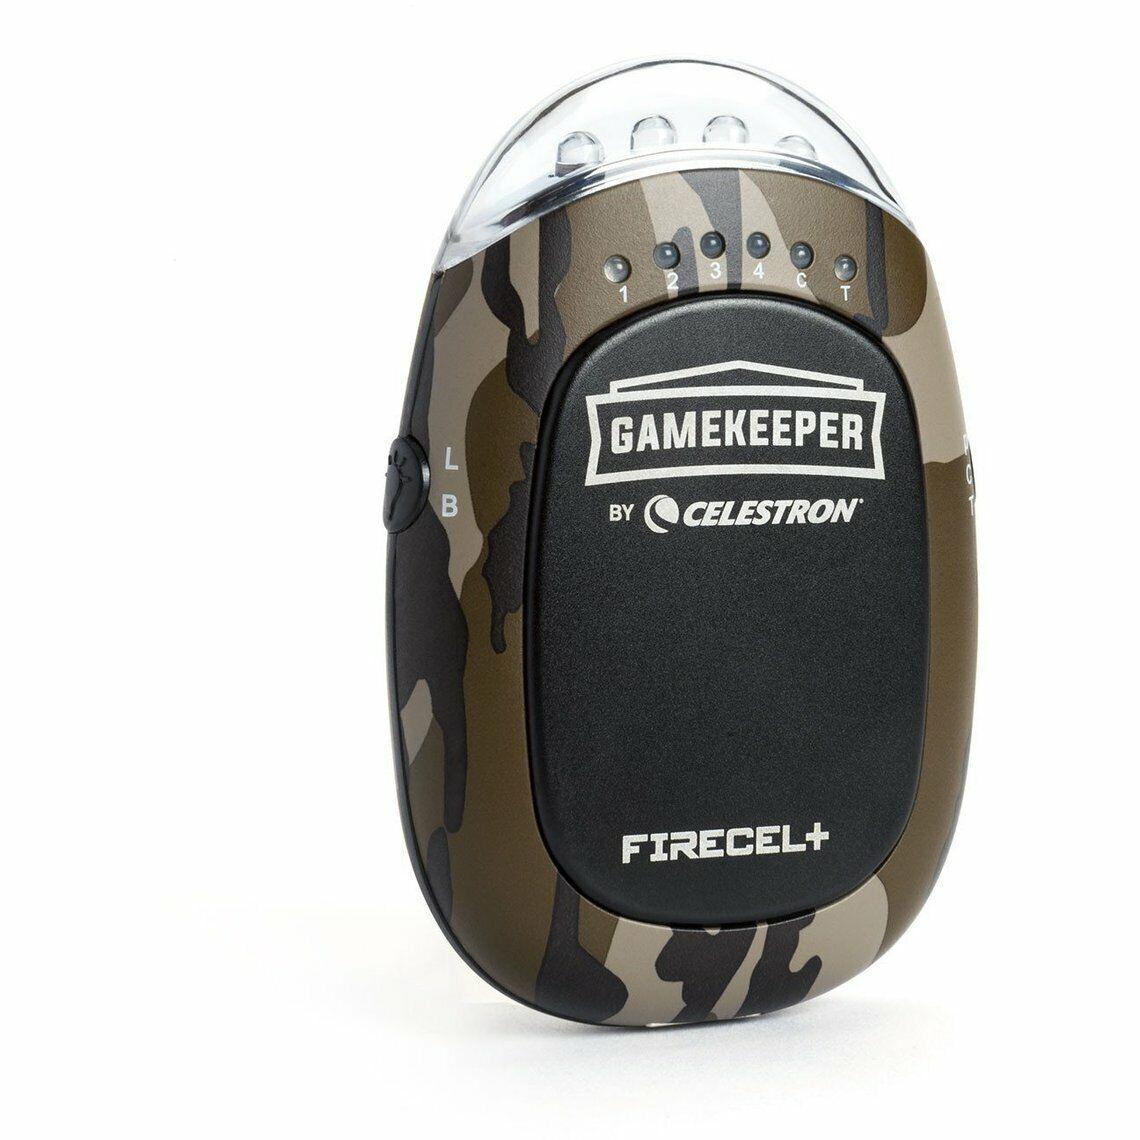 Celestron Gamekeeper FireCel+ Portable 5200 Power Bank in Camo #93549 (UK) BNIB